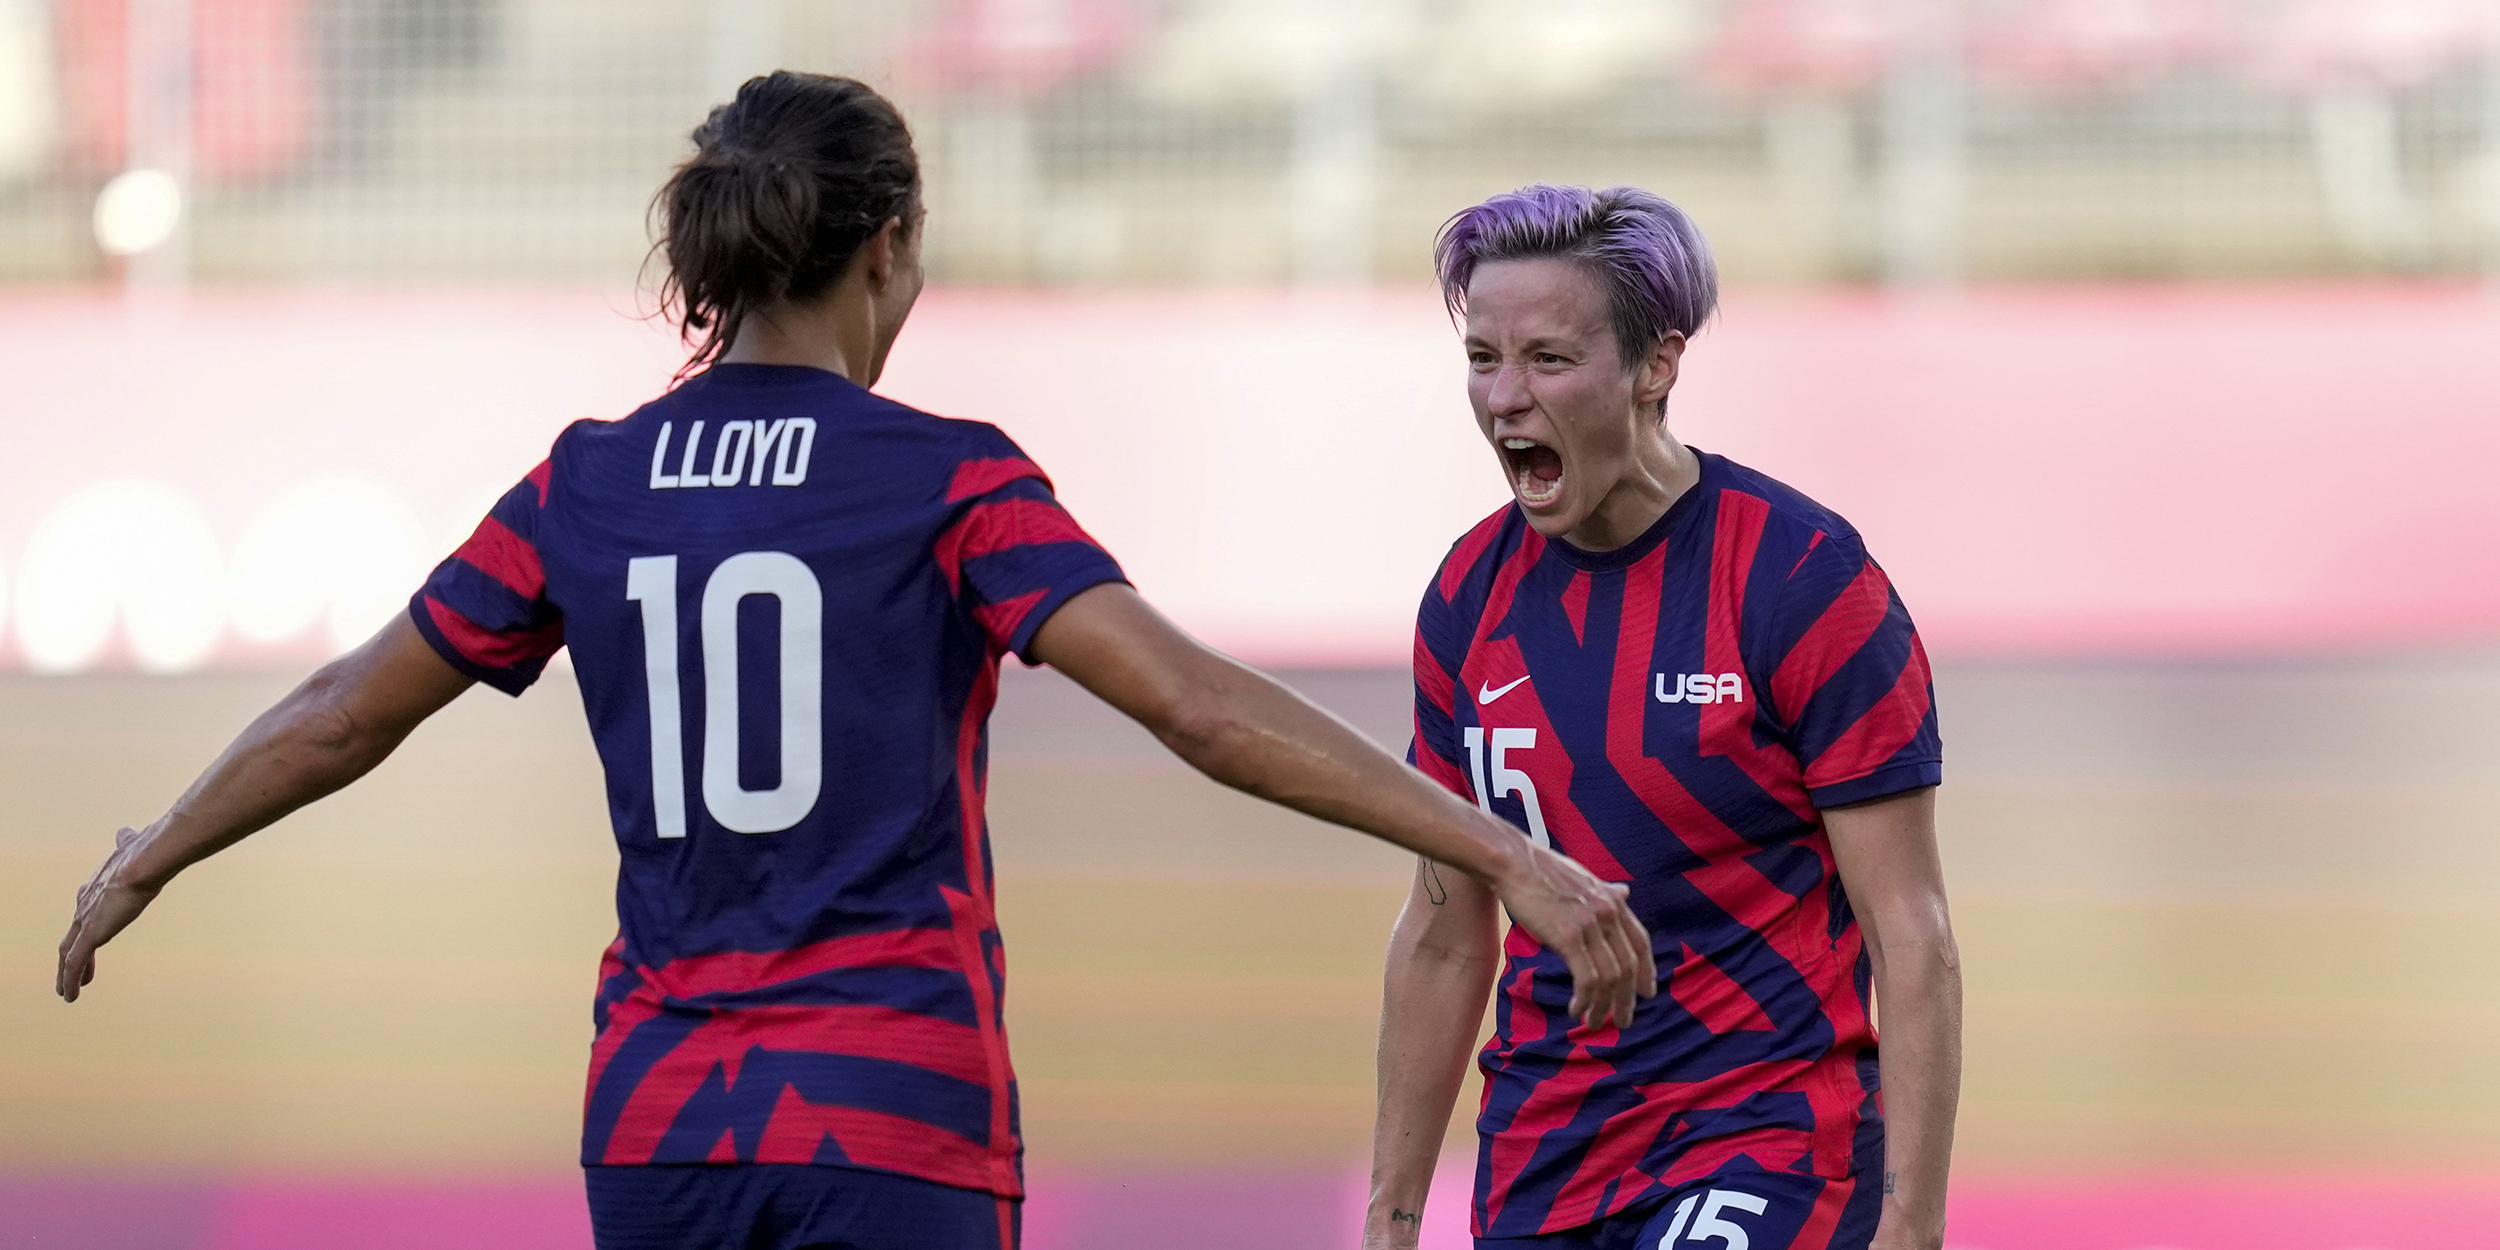 U.S. beats Australia 4-3, wins Olympic bronze in likely end for golden era of women's soccer